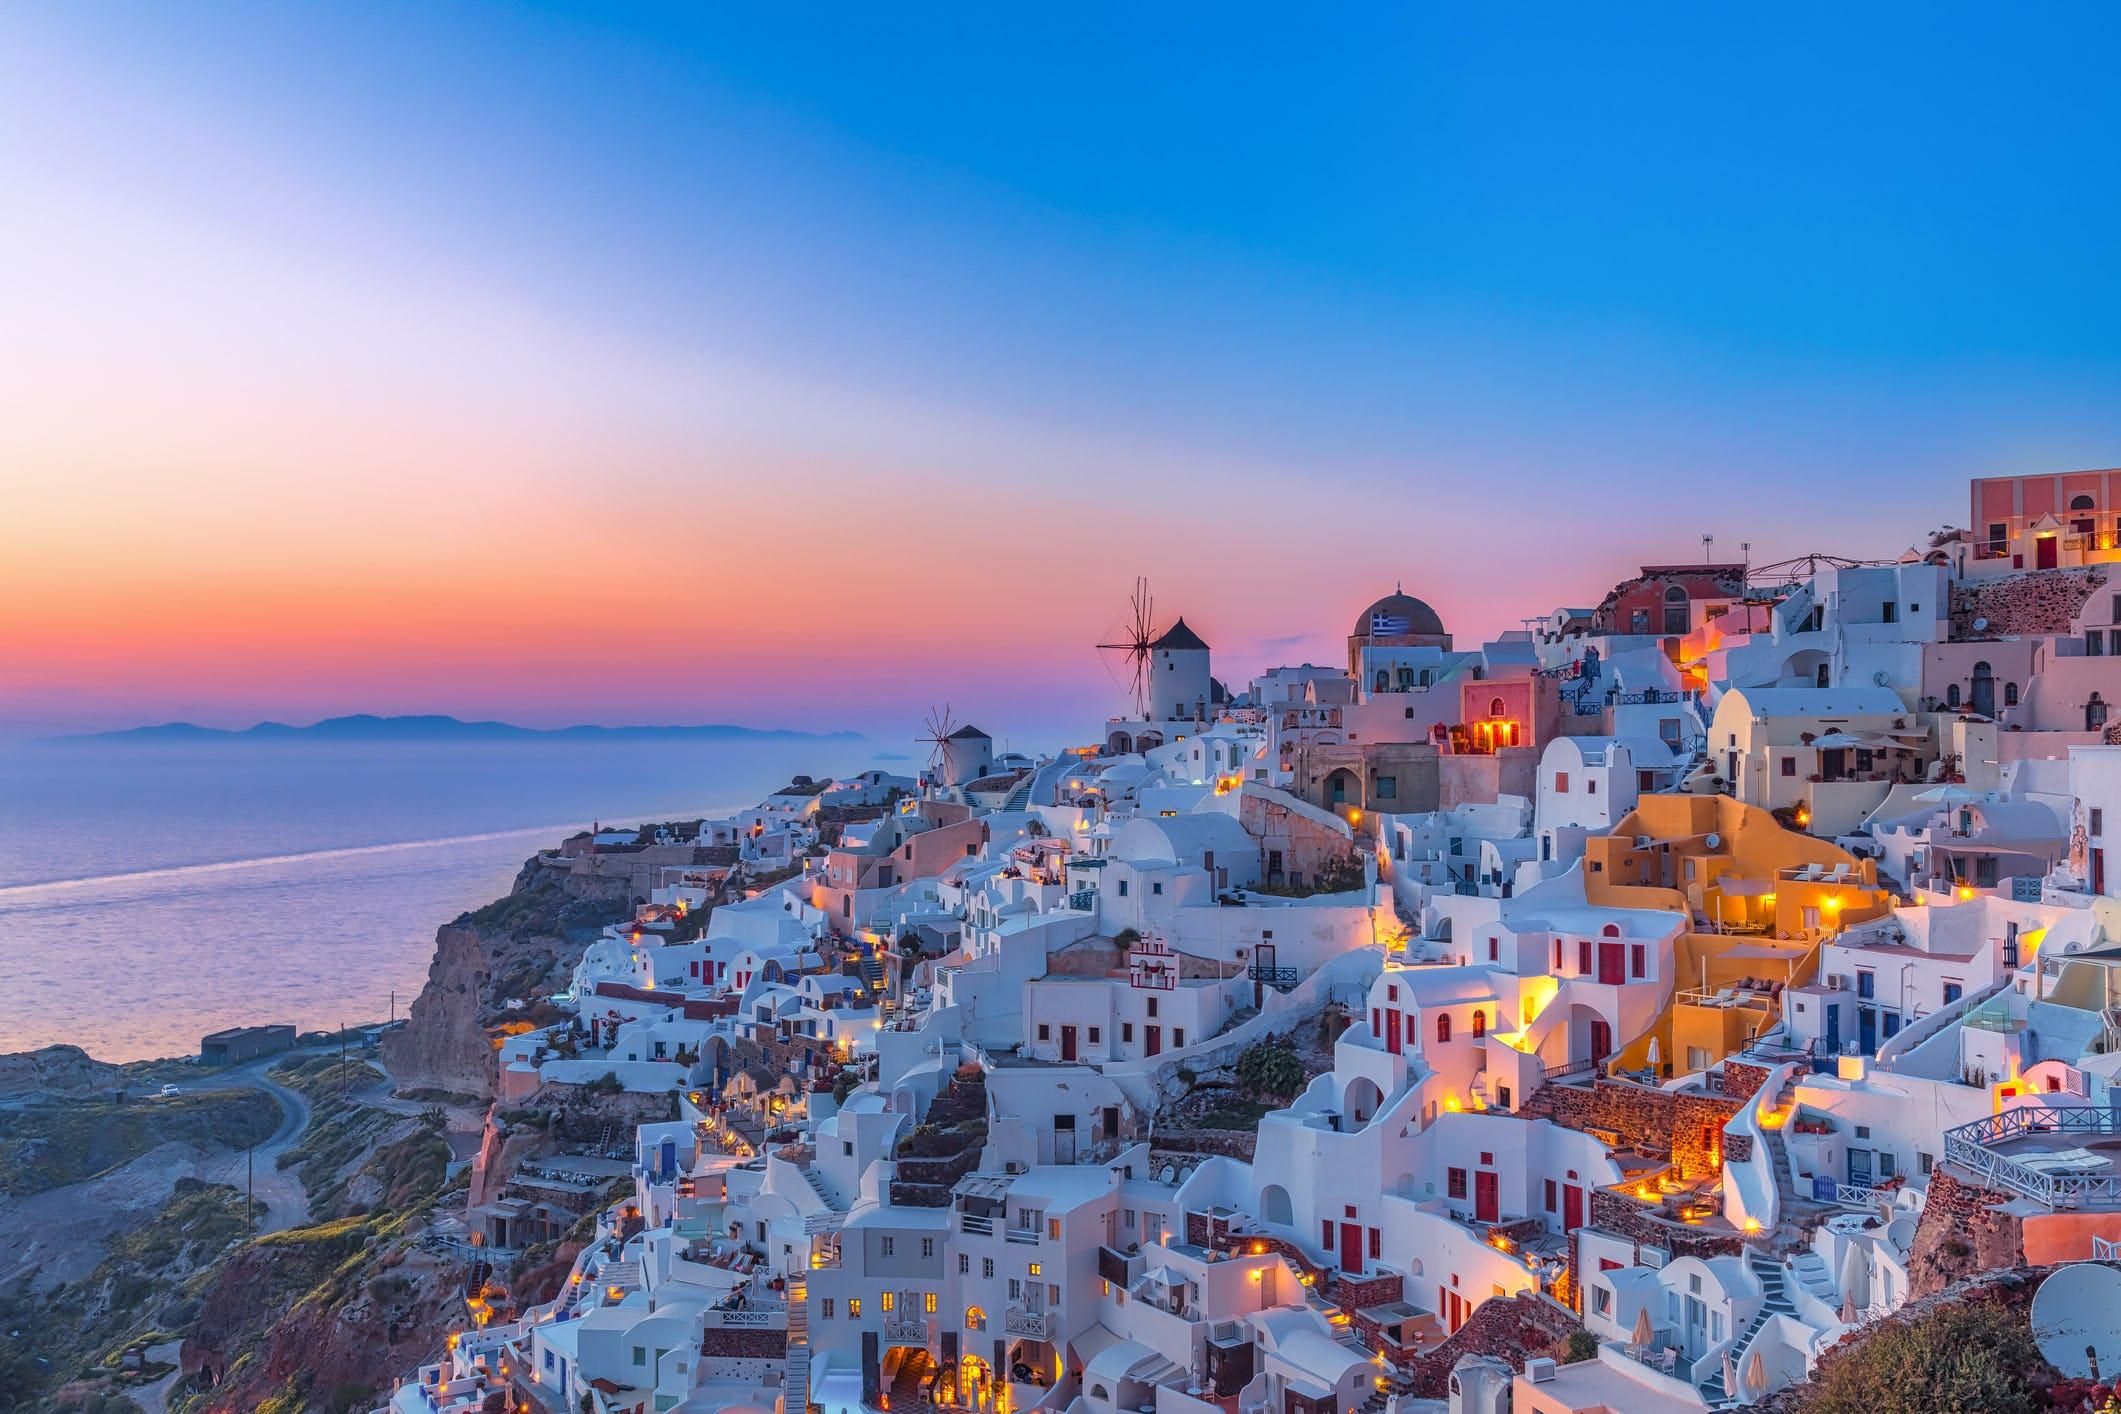 Oia Santorini, Hellas, Middelhavet @VogelSP, Getty Images